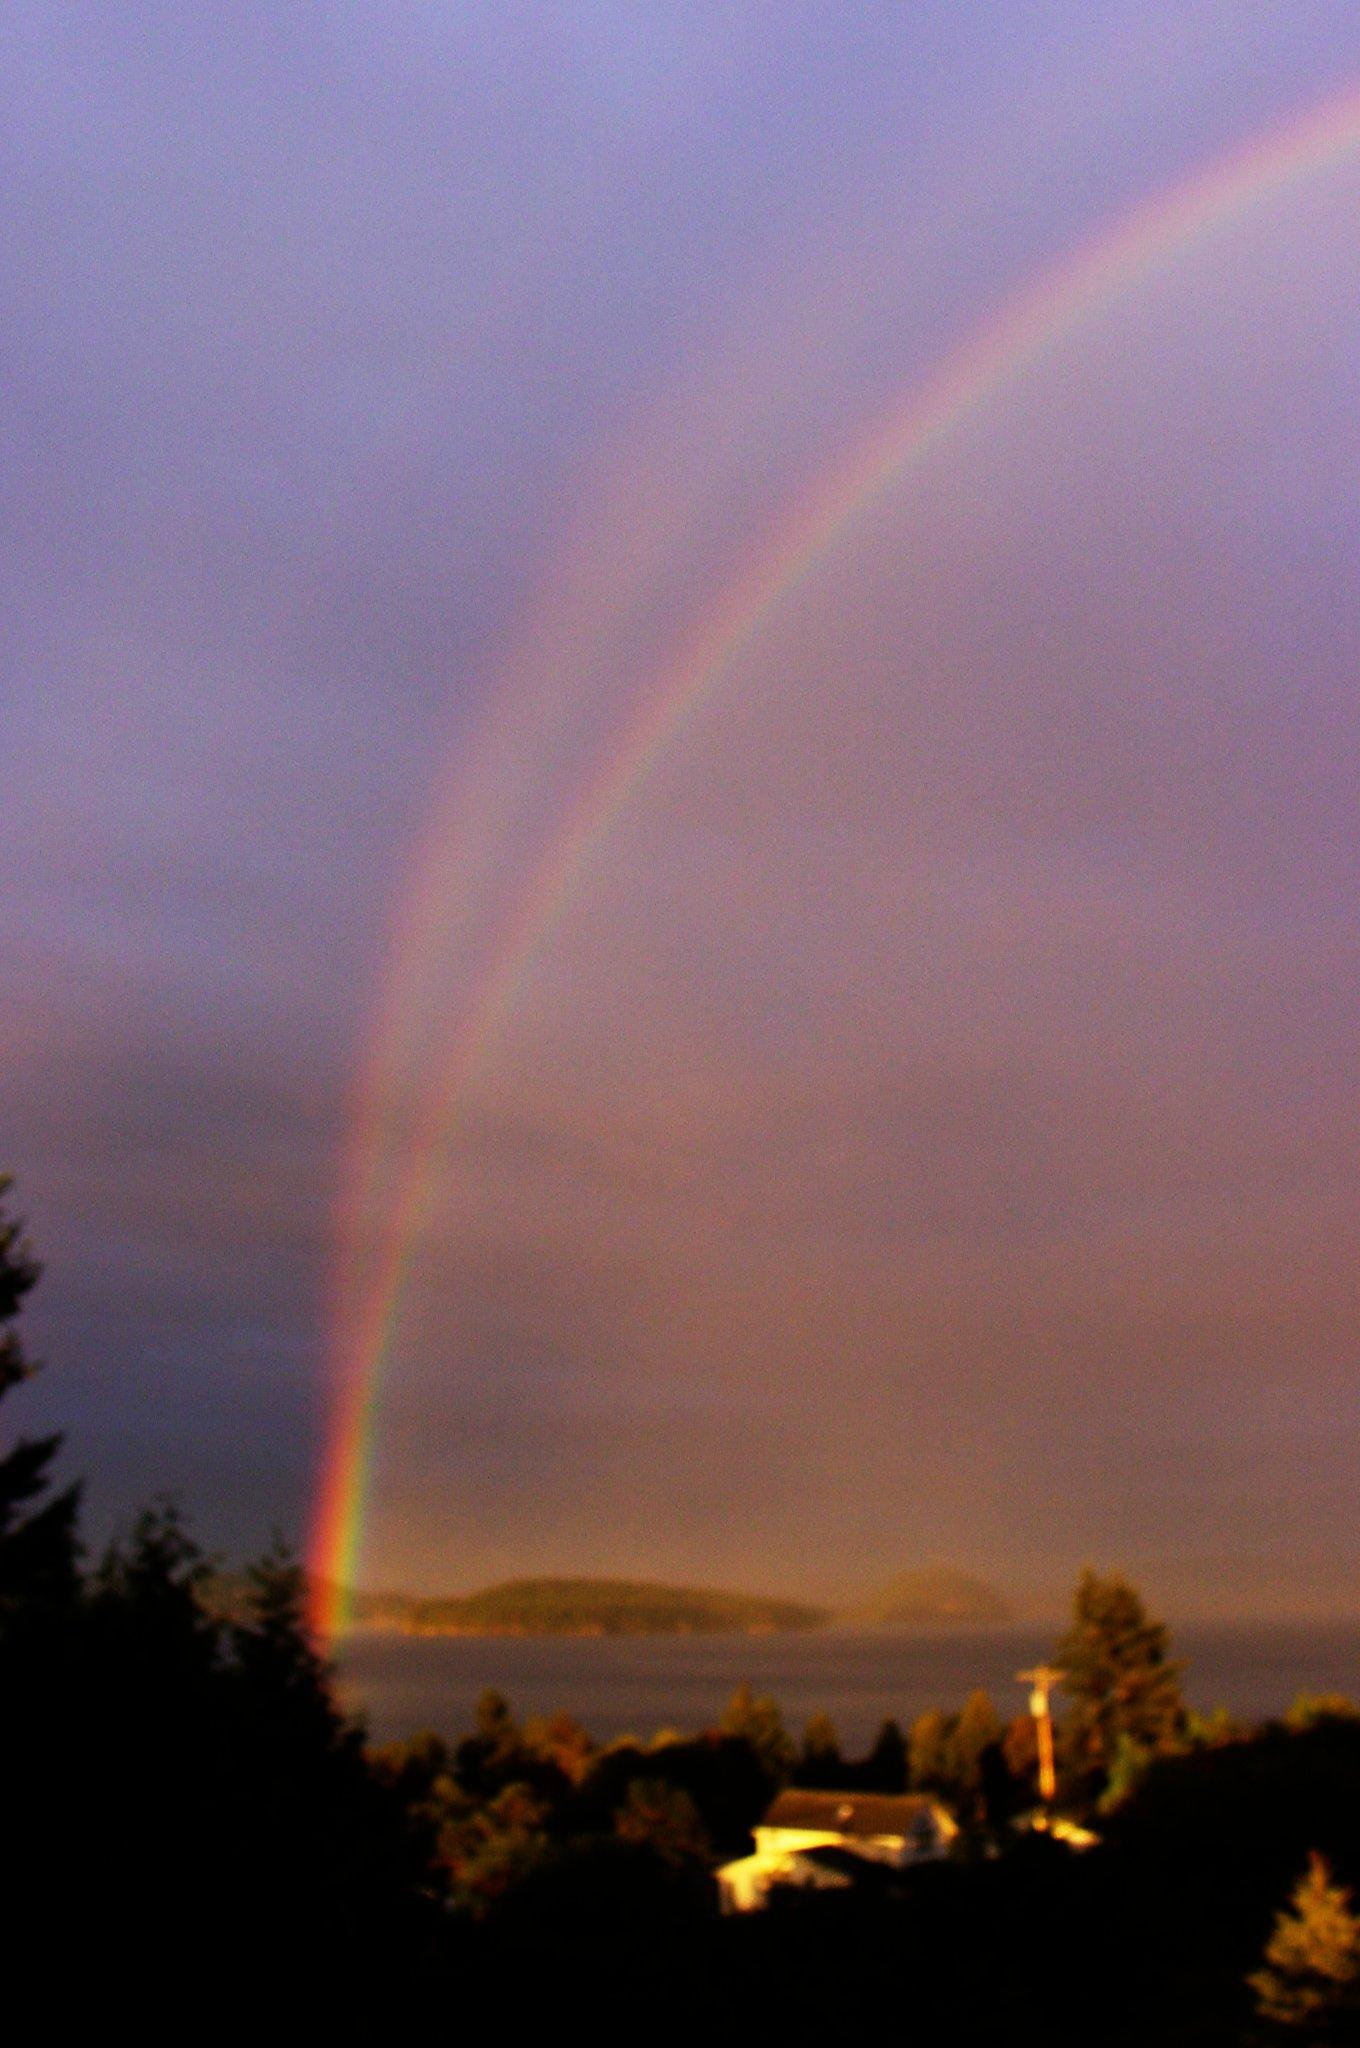 50 incredible inspirational double rainbows pics